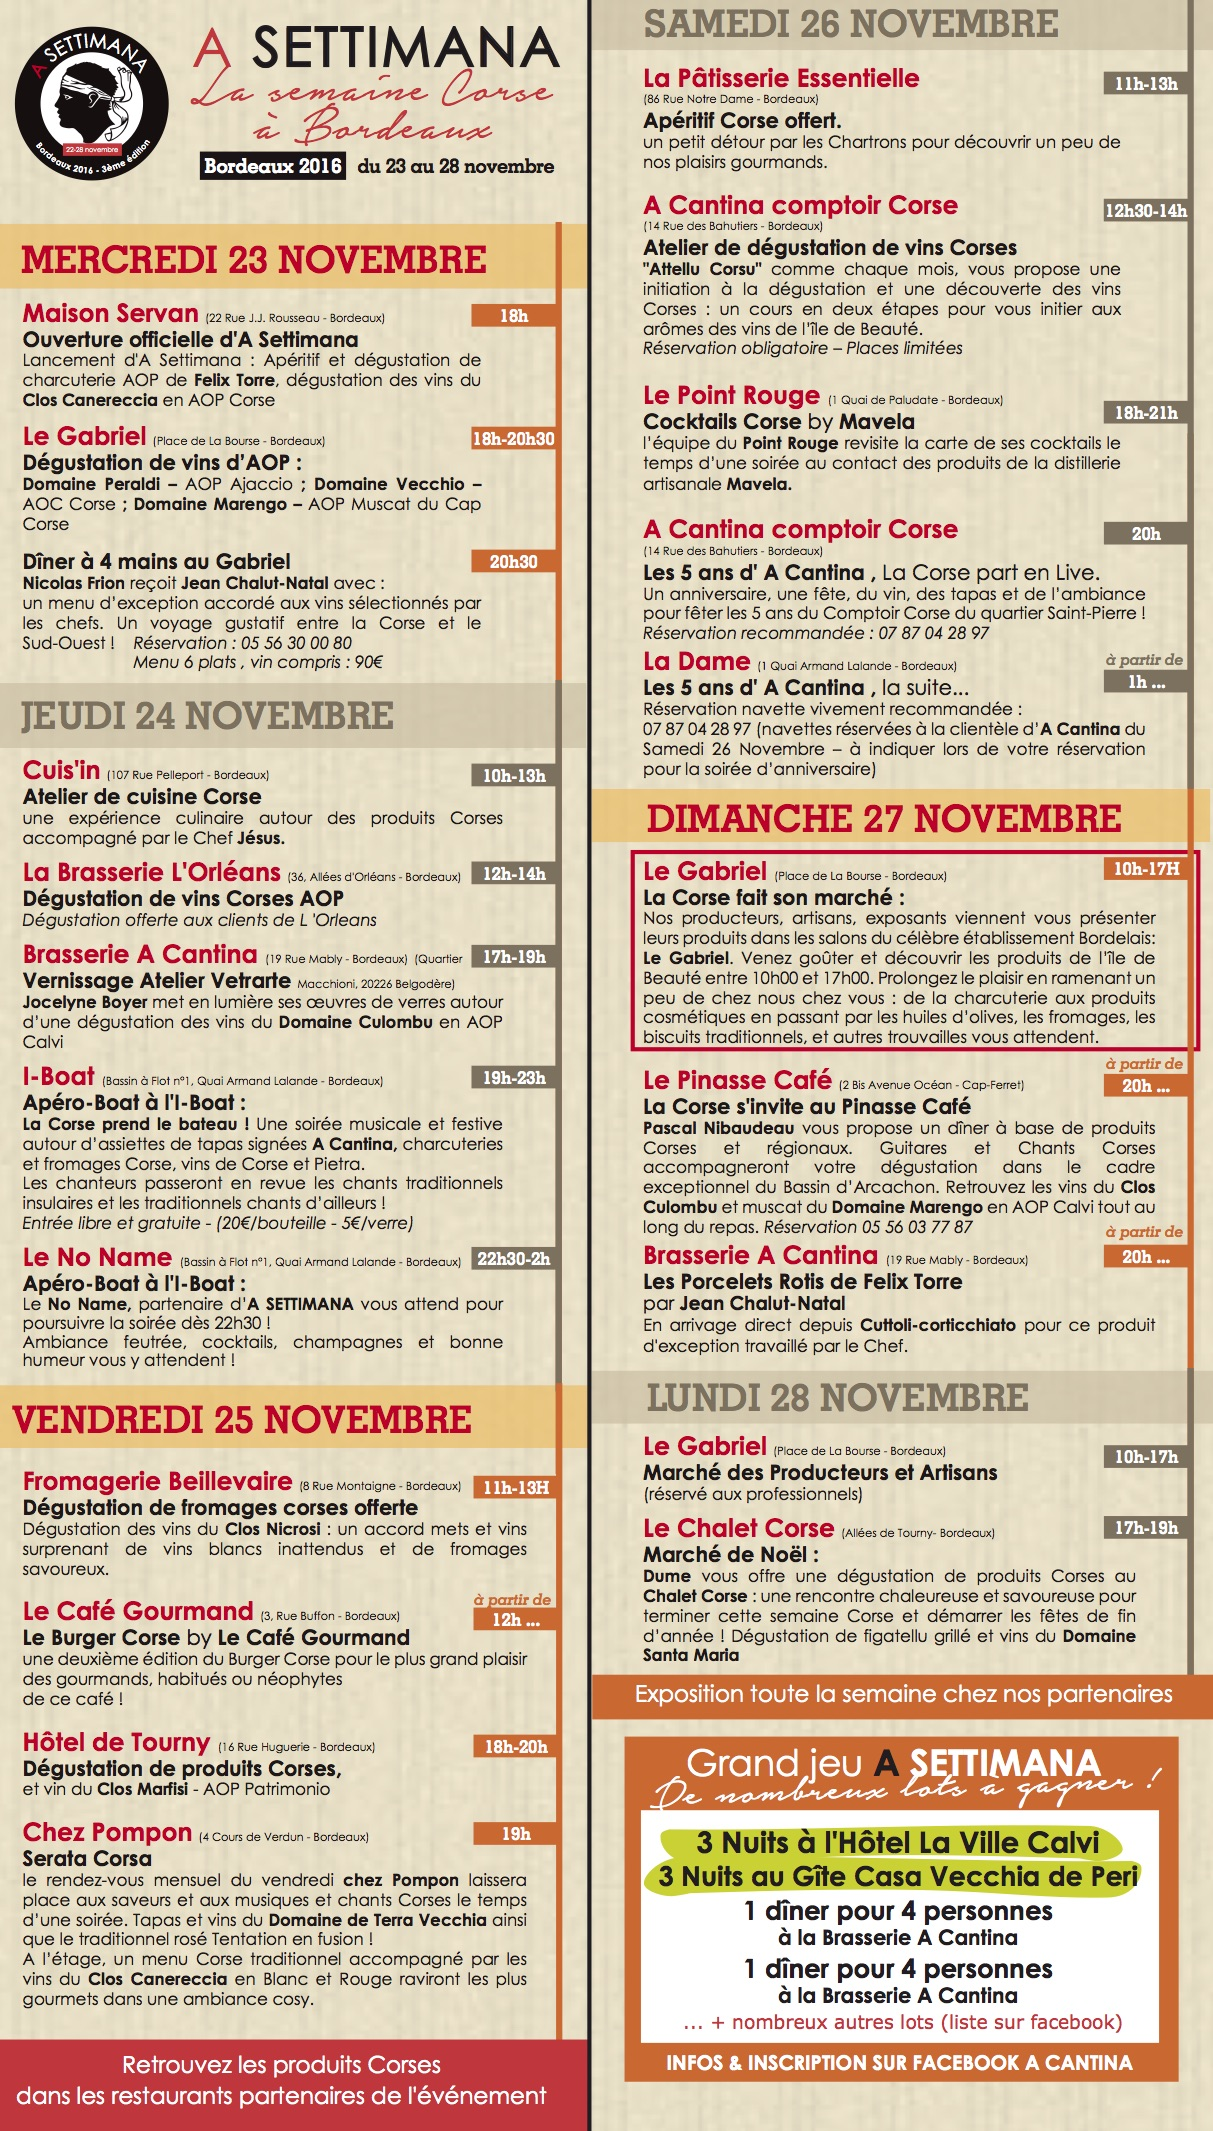 a-settimana-programme-b-02-11-16